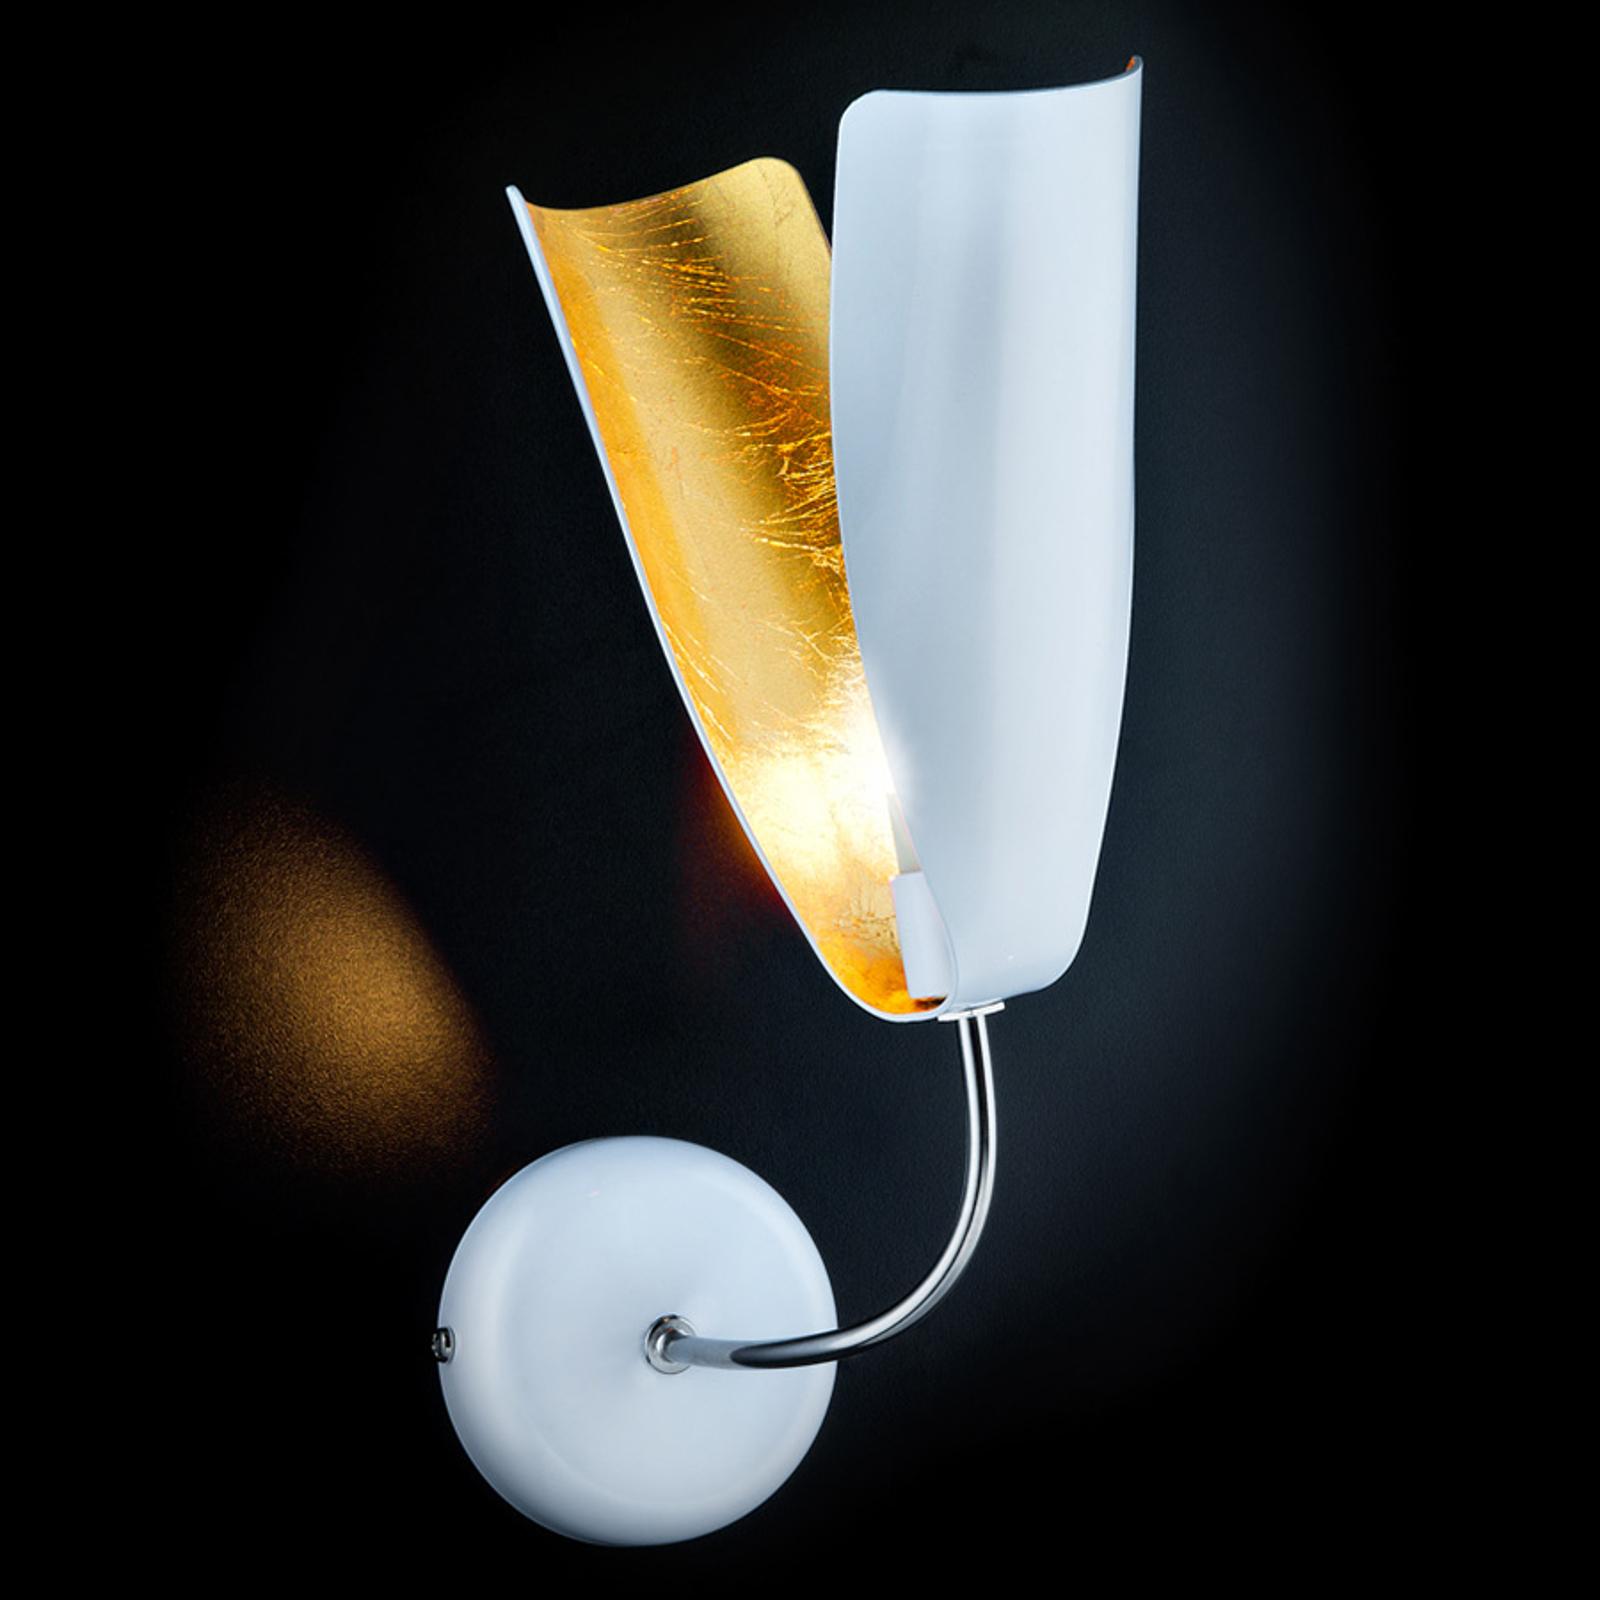 Wandlamp Tropic met bladgoud